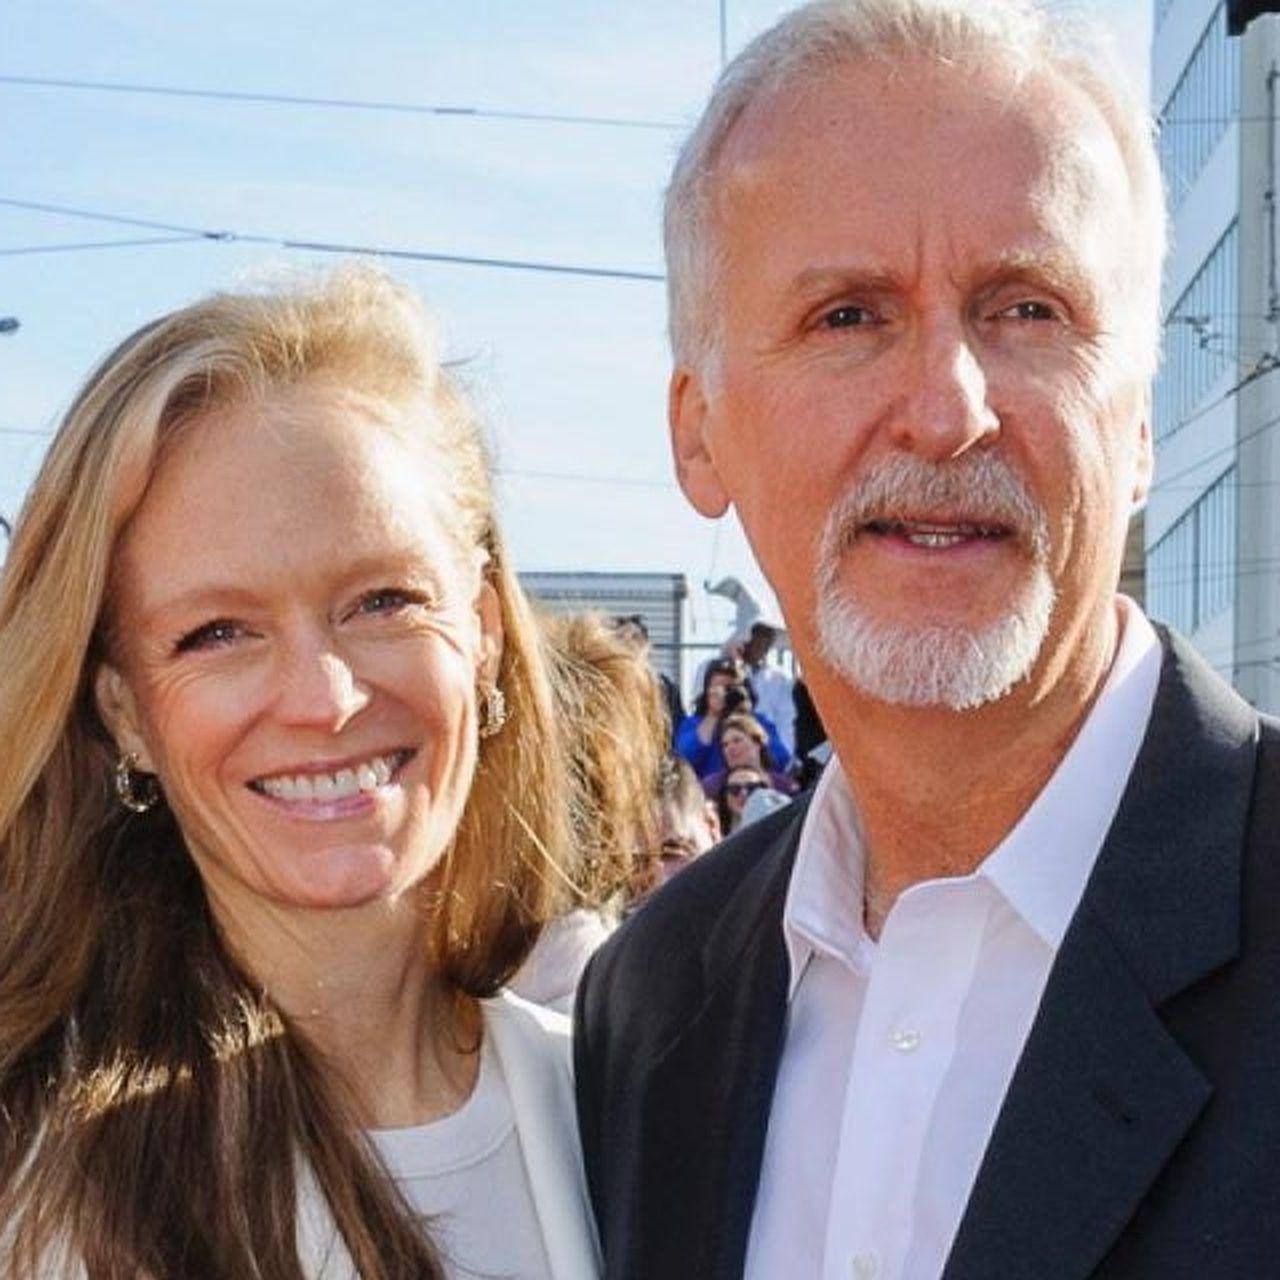 James and suzy cameron to open vegan schools across us